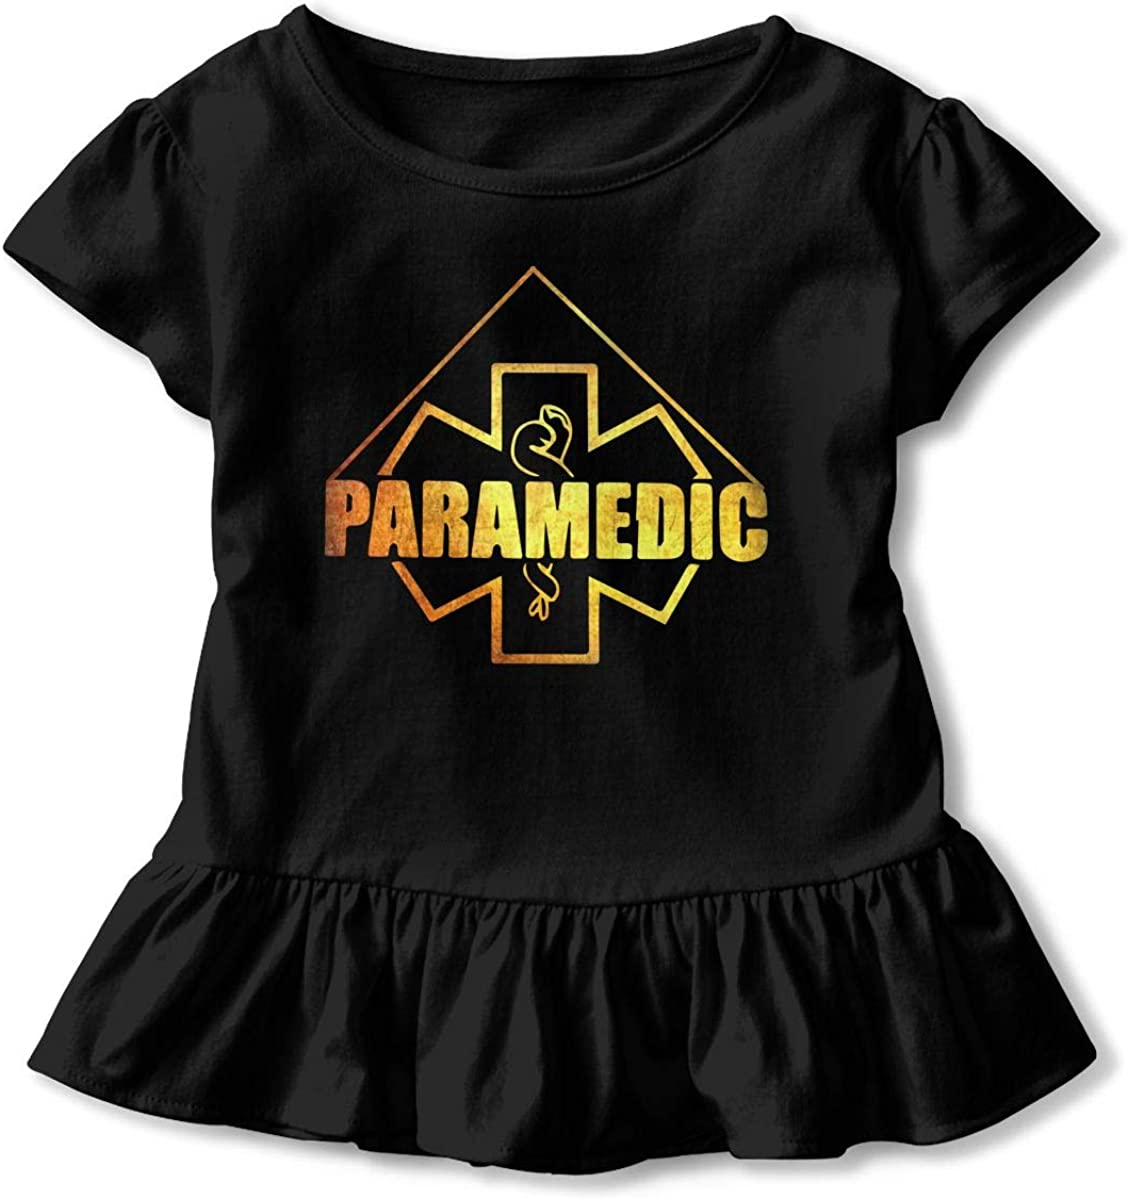 Cheng Jian Bo Paramedic Performance Toddler Girls T Shirt Kids Cotton Short Sleeve Ruffle Tee